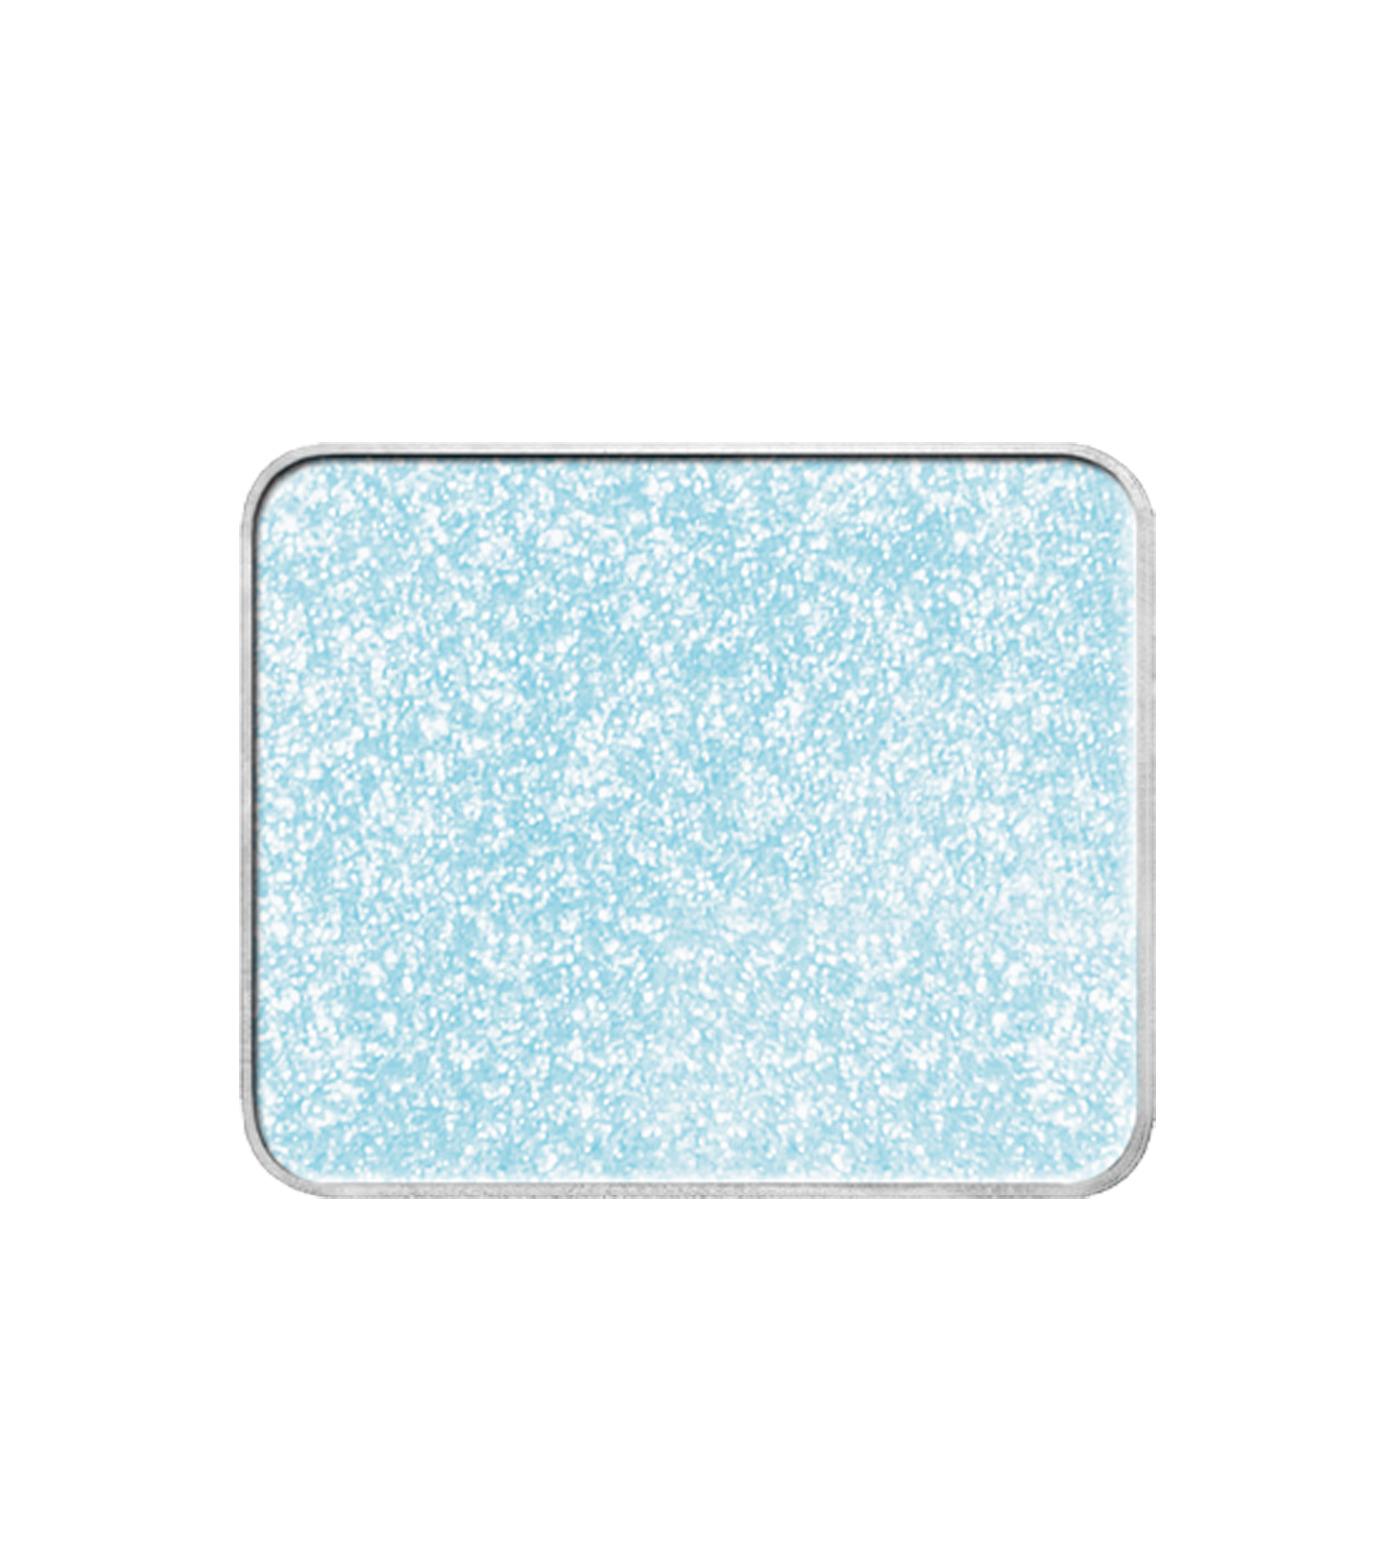 Yazbukey for shu uemura(ヤズブキー for シュウ ウエムラ)のDuo Eye Shadow -Blue--BLUE(MAKE-UP/MAKE-UP)-F5621500-900-92 拡大詳細画像3